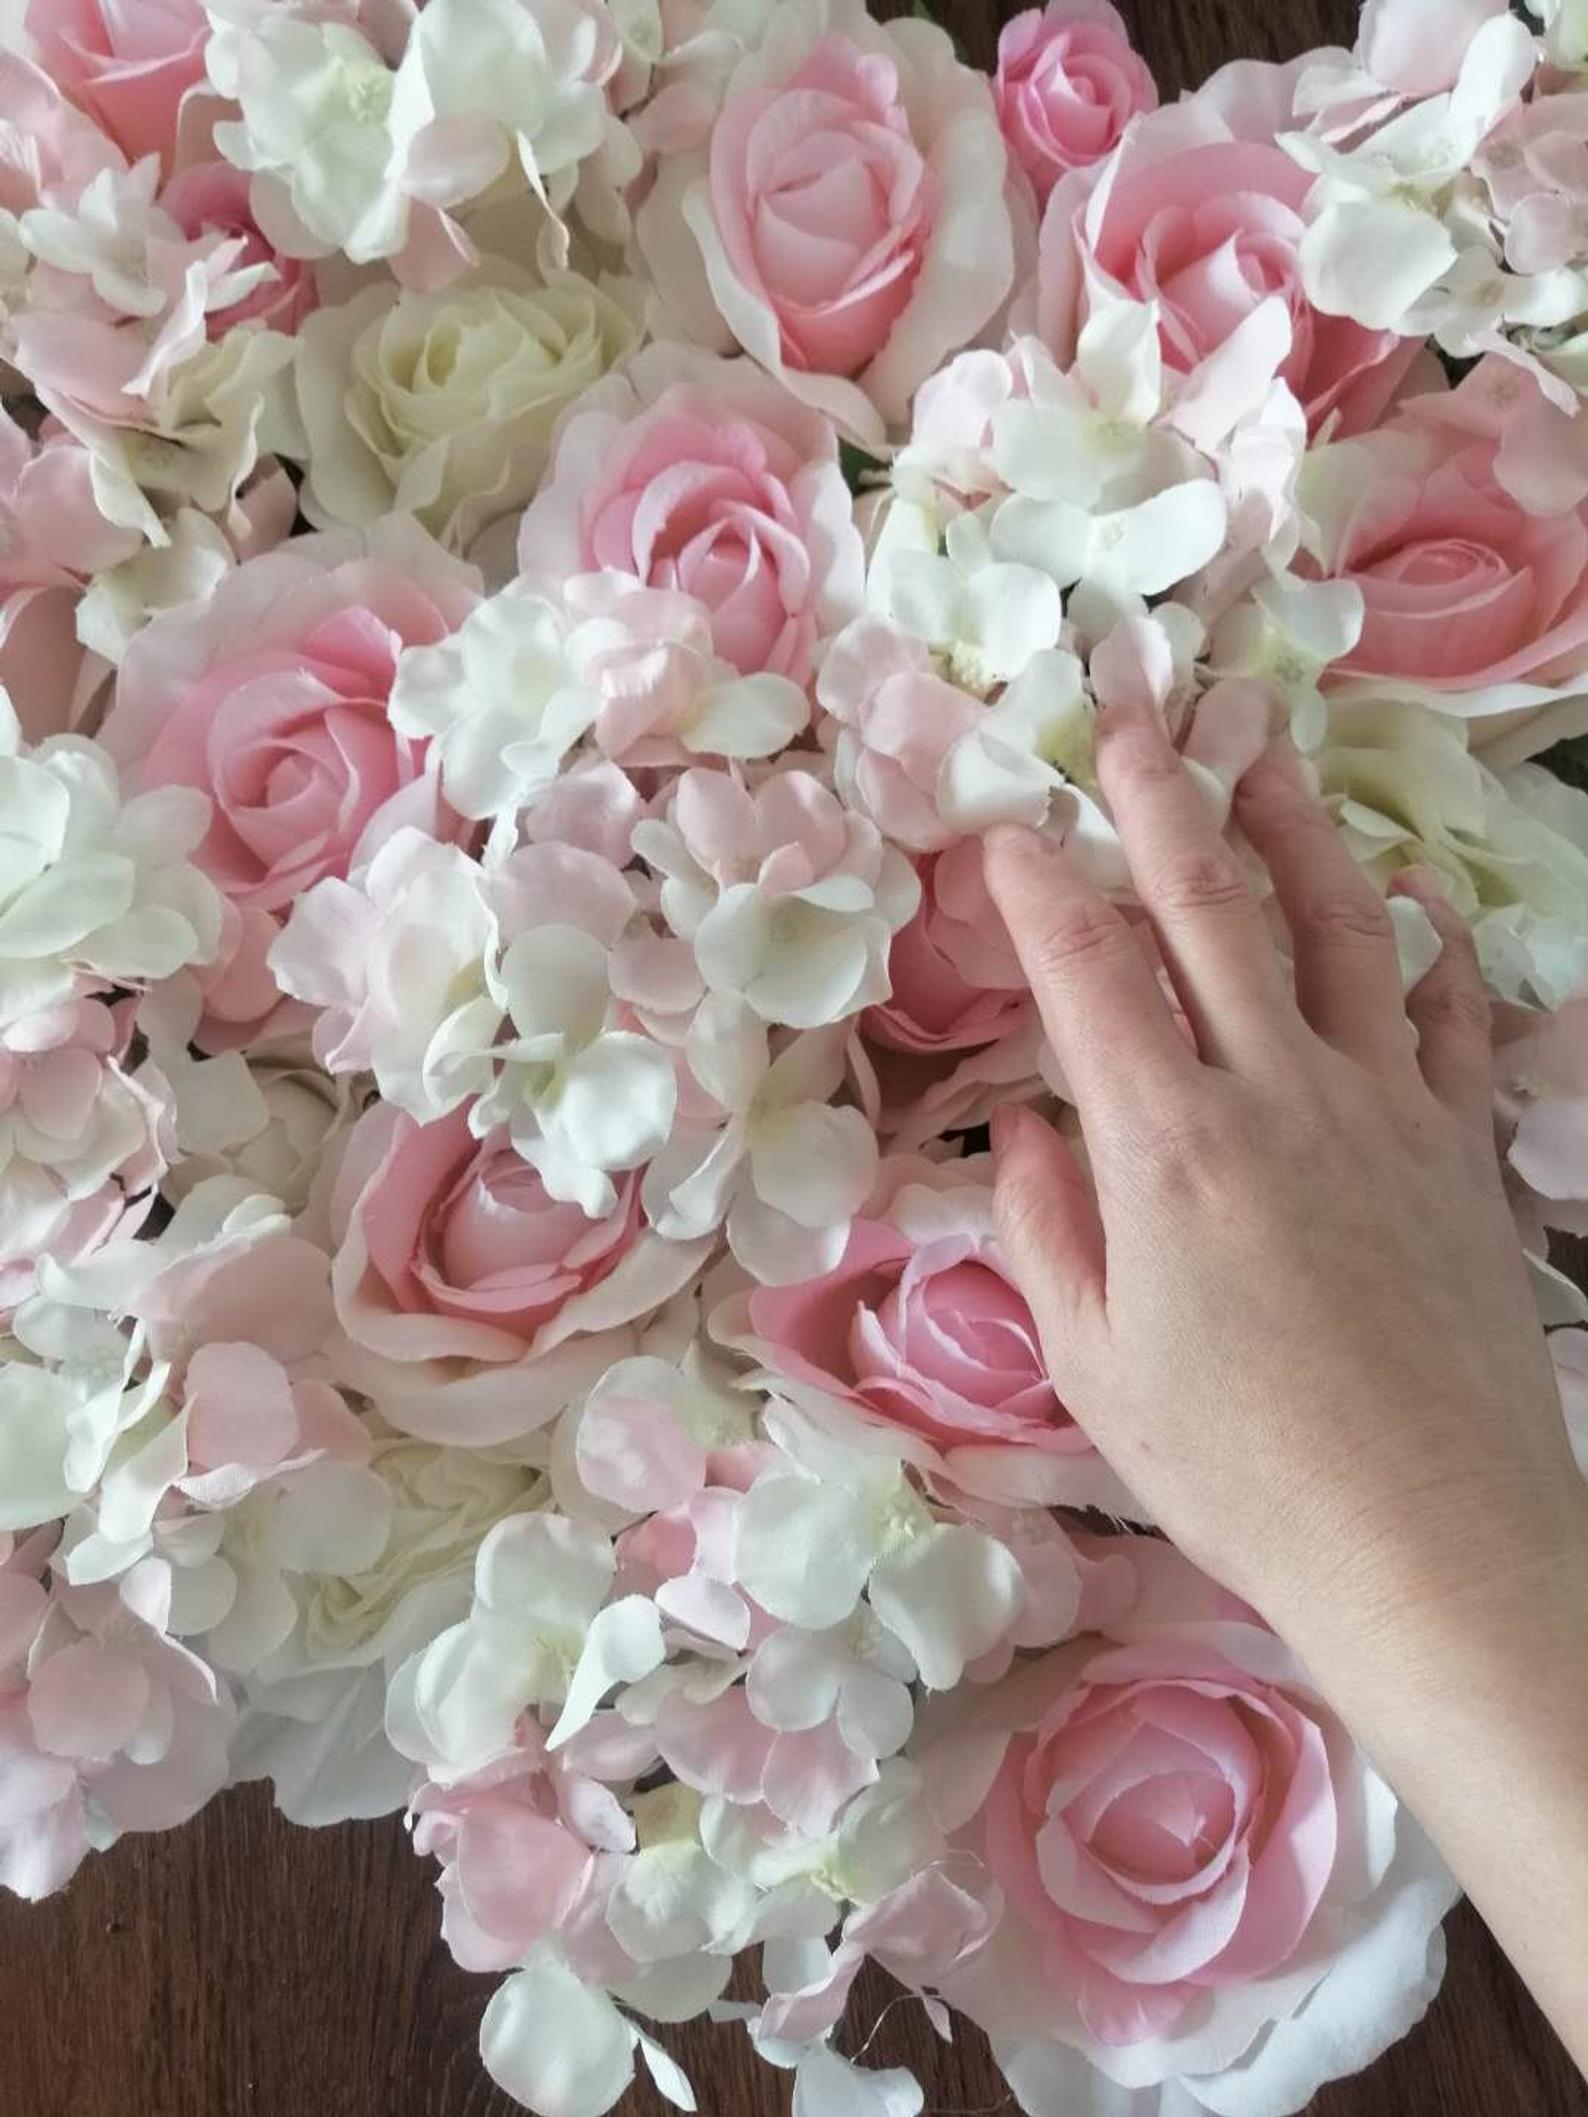 Baby Pink Wedding Flower Walls Wedding Backdrops Artifical Silk Rose Hydrangea Background For Romantic Wedding Photography Panels 40 60cm Flower Wall Wedding Baby Pink Wedding Pink Wedding Flowers